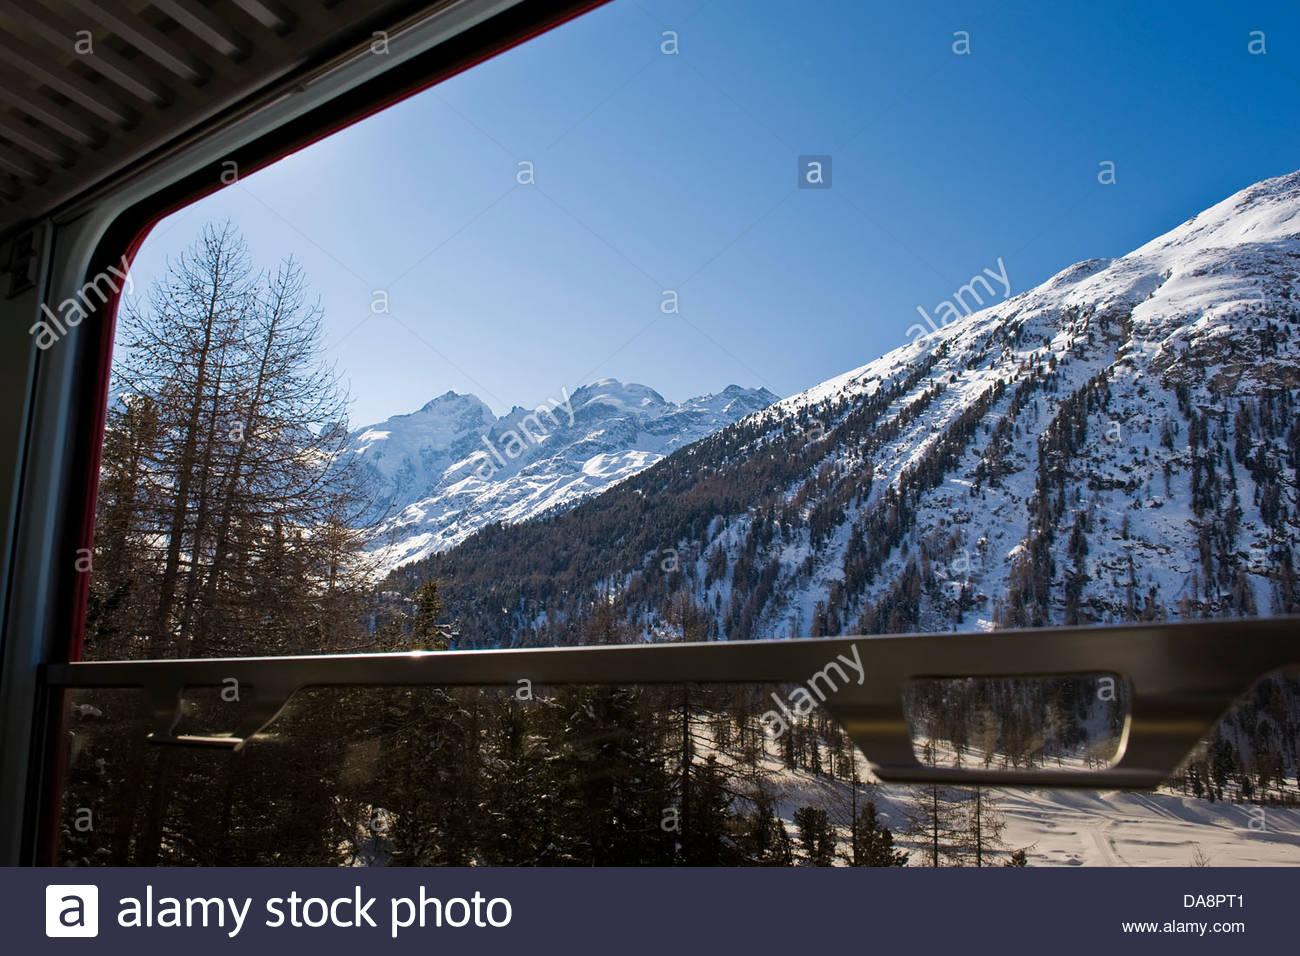 Morteratsch glacier,Bernina express,Switzerland - Stock Image